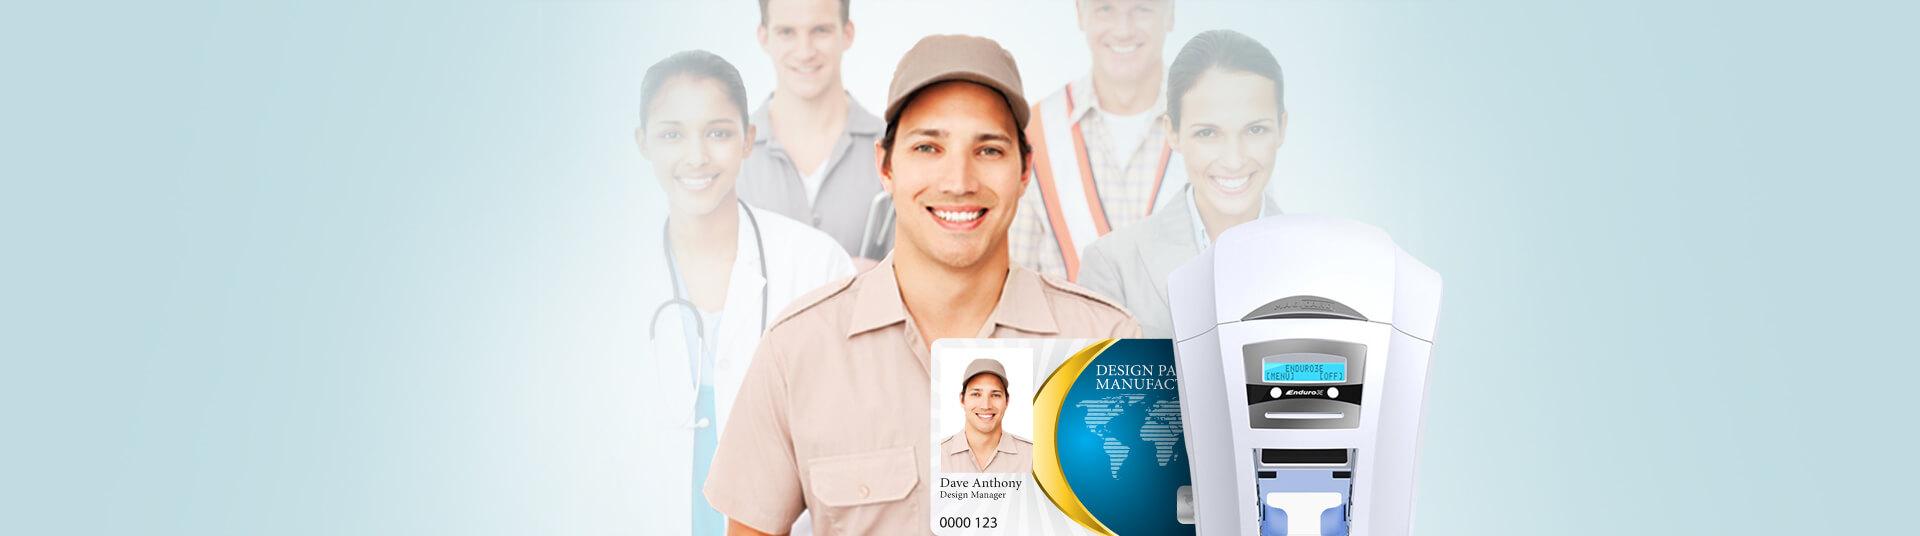 Hospital Access Control Cards